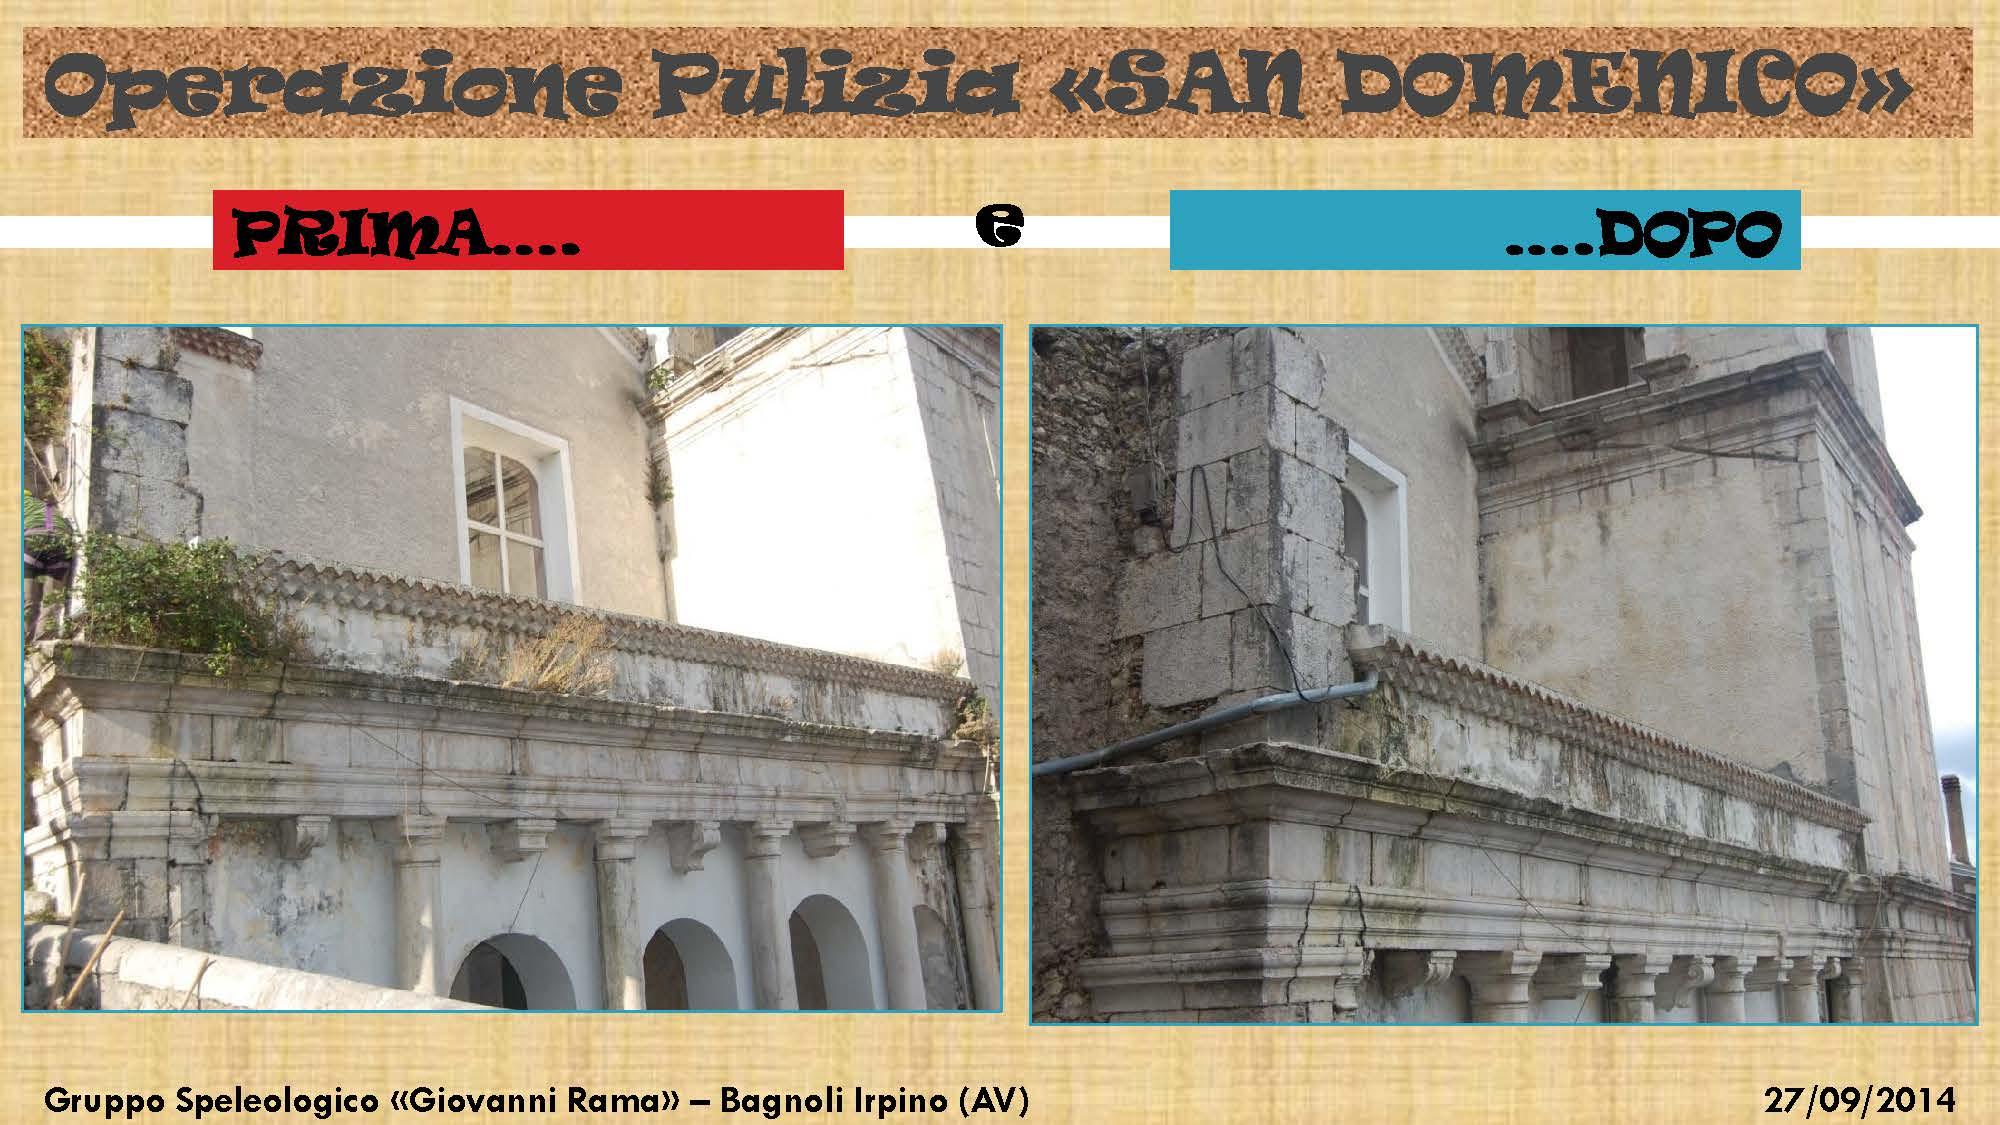 Bagnoli-Pulizia-San-Domenico-2014_Pagina_08